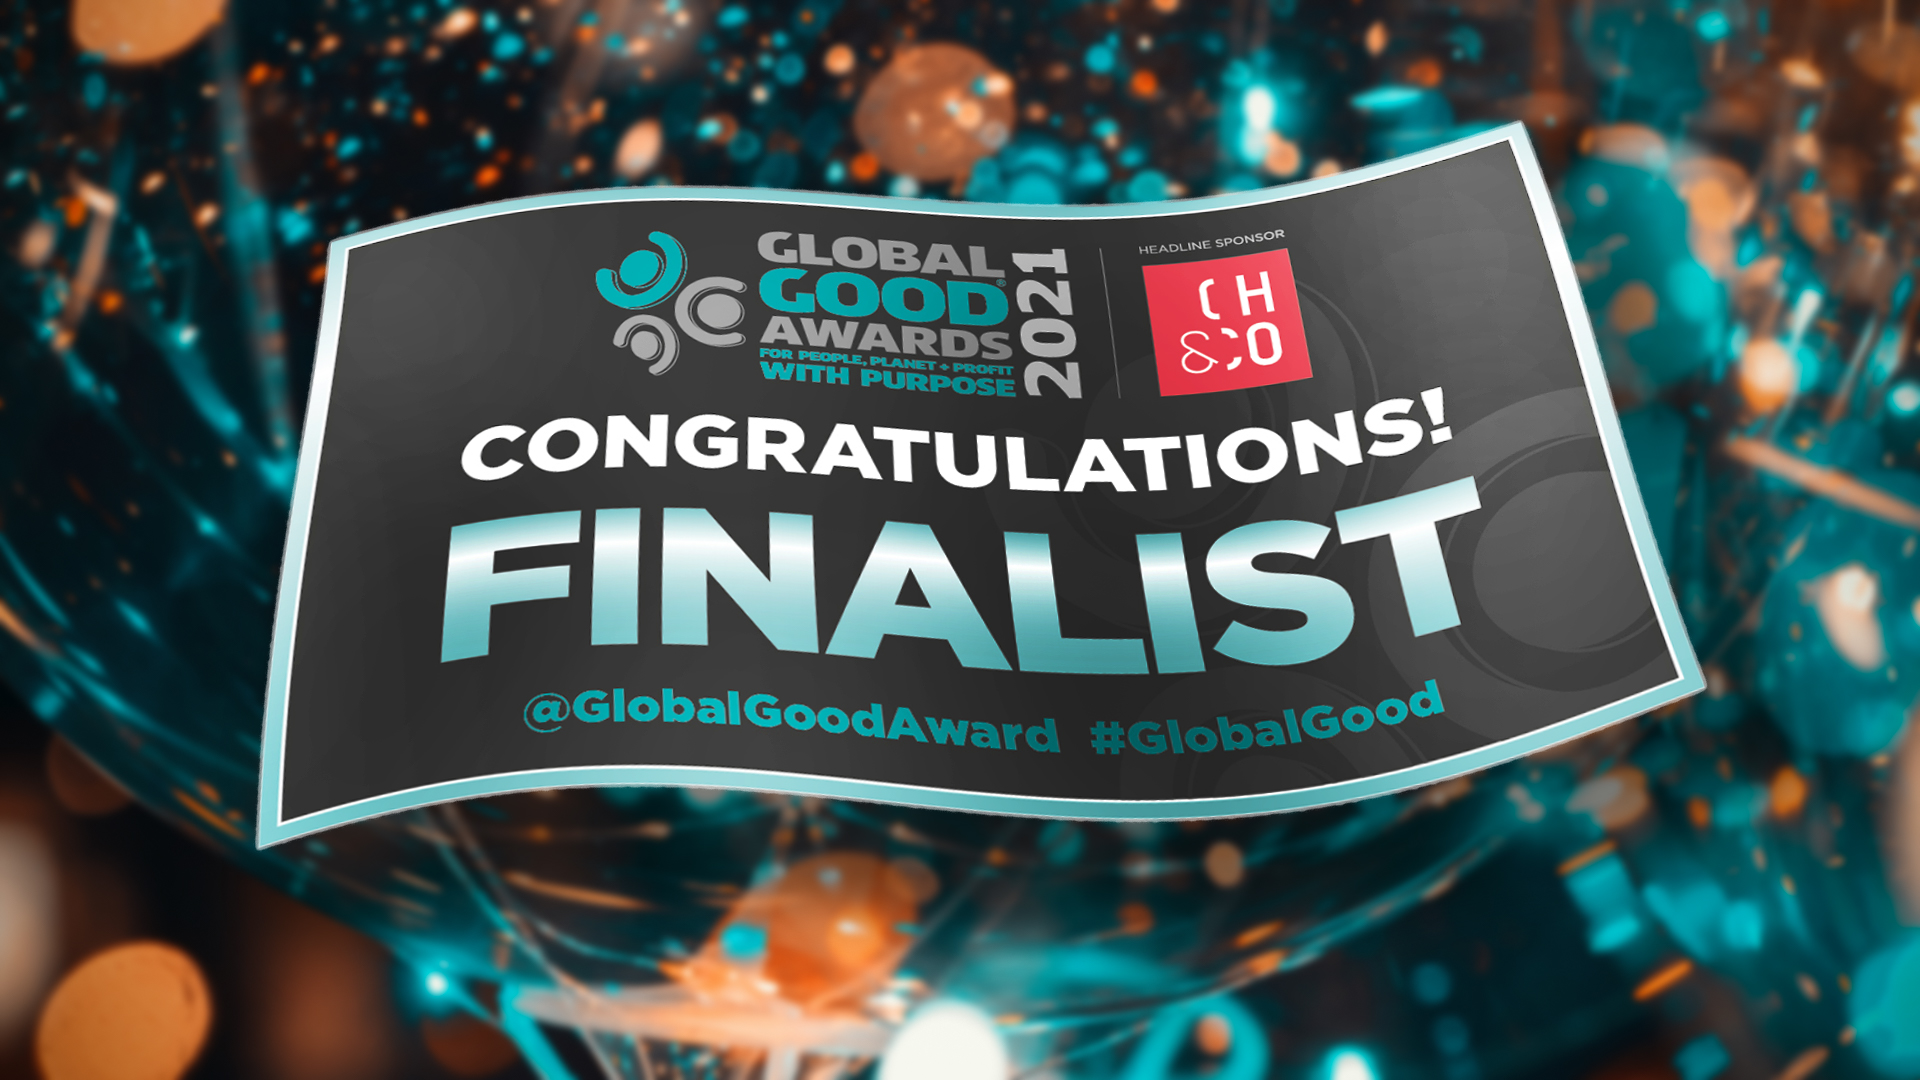 TCi is a Global Good Awards Finalist